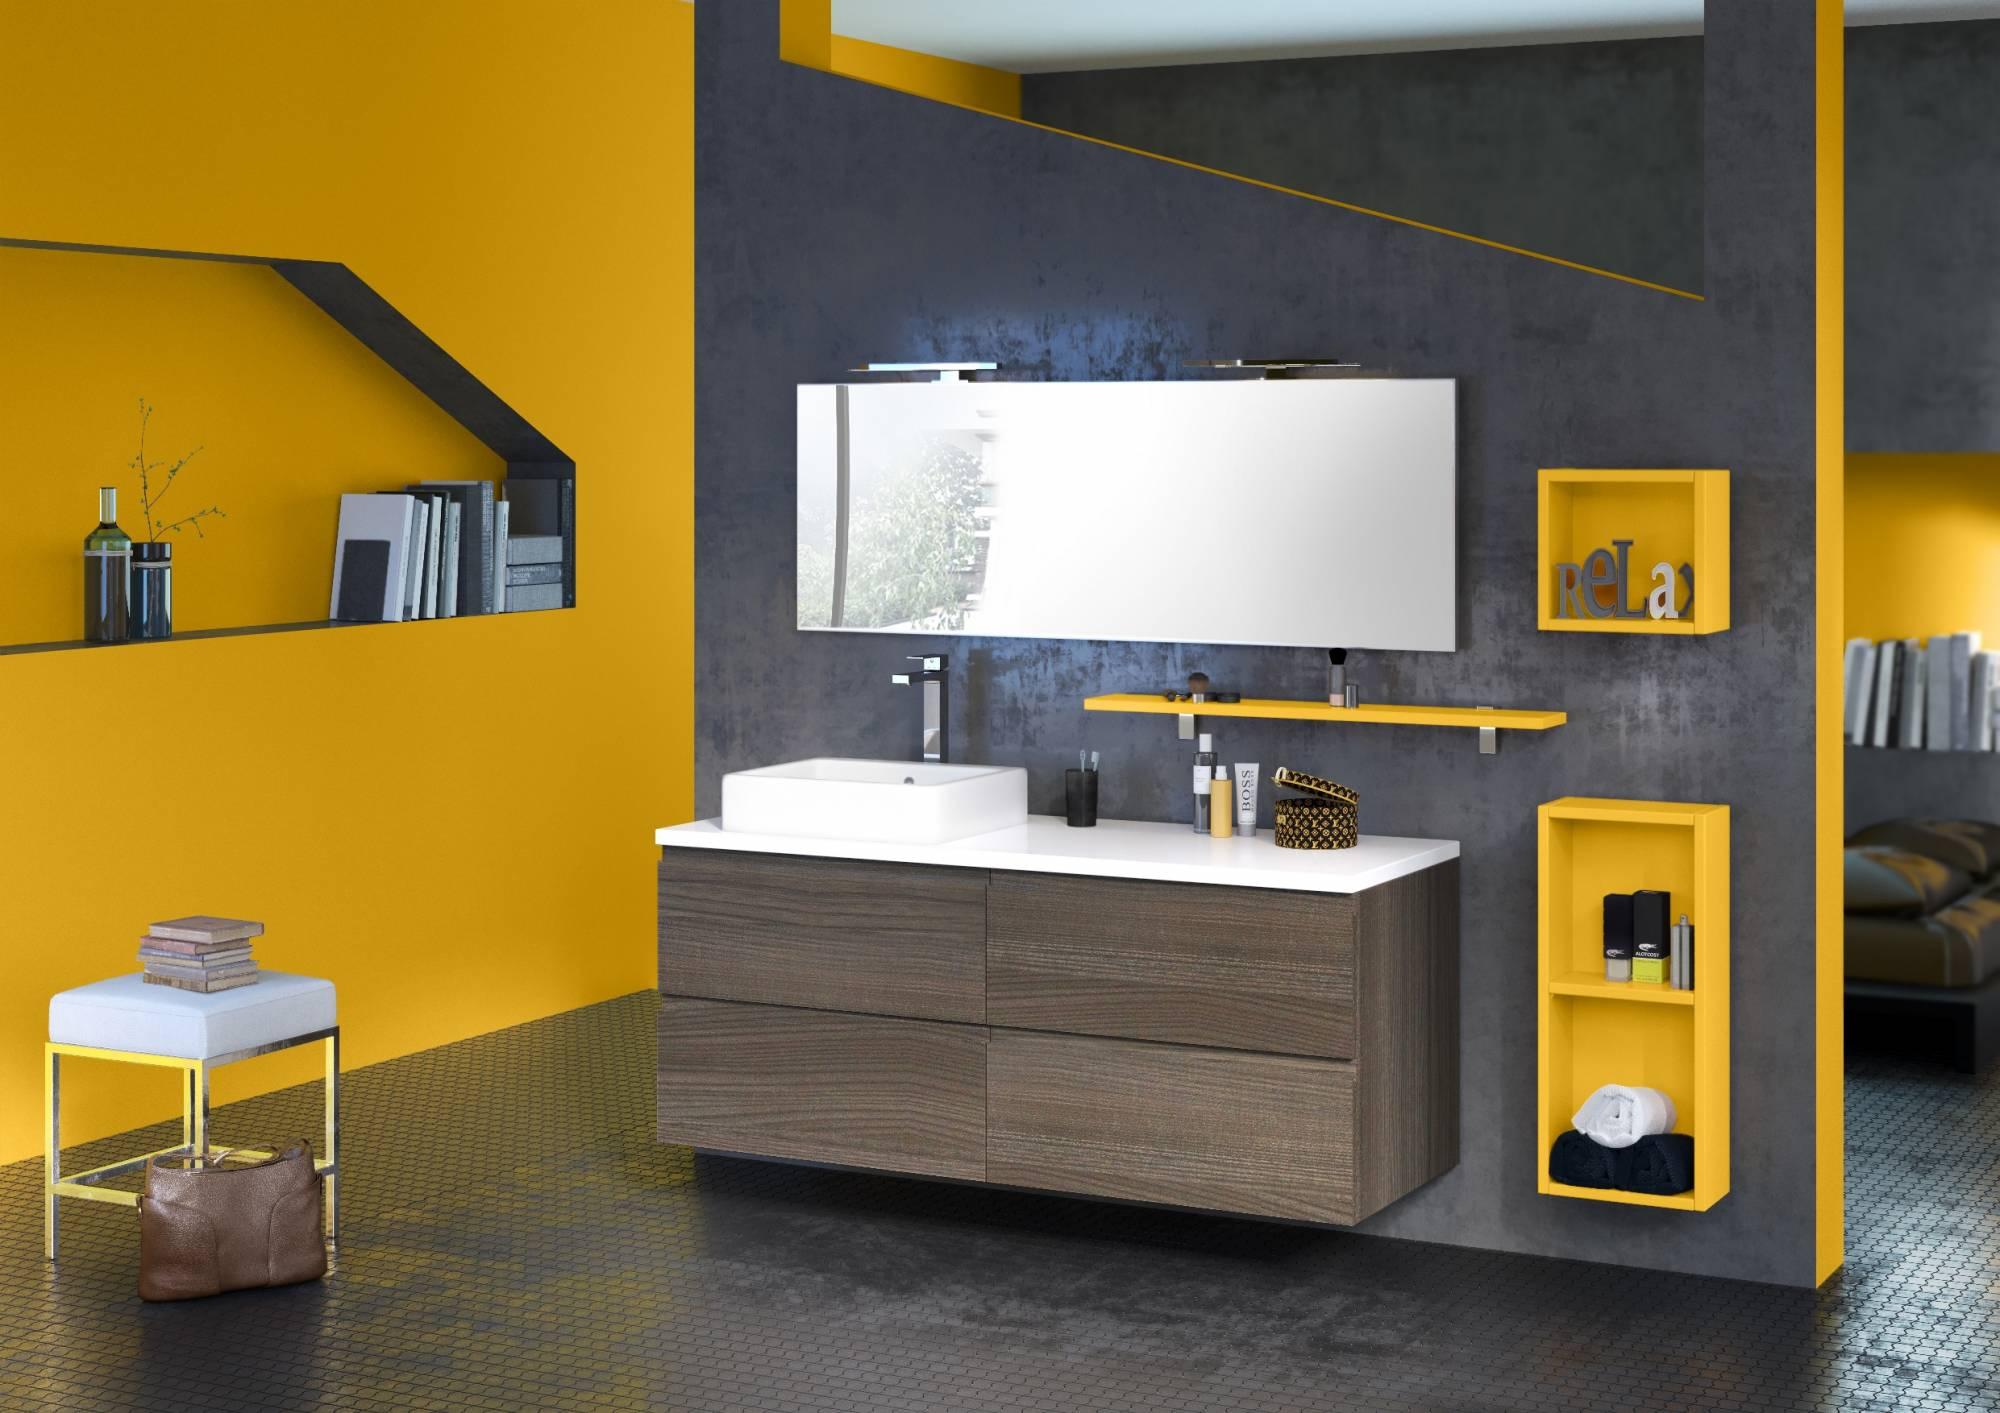 Meuble Salle De Bain Couleur Or ~ vente de meuble suspendu pour salle de bains eguilles 13510